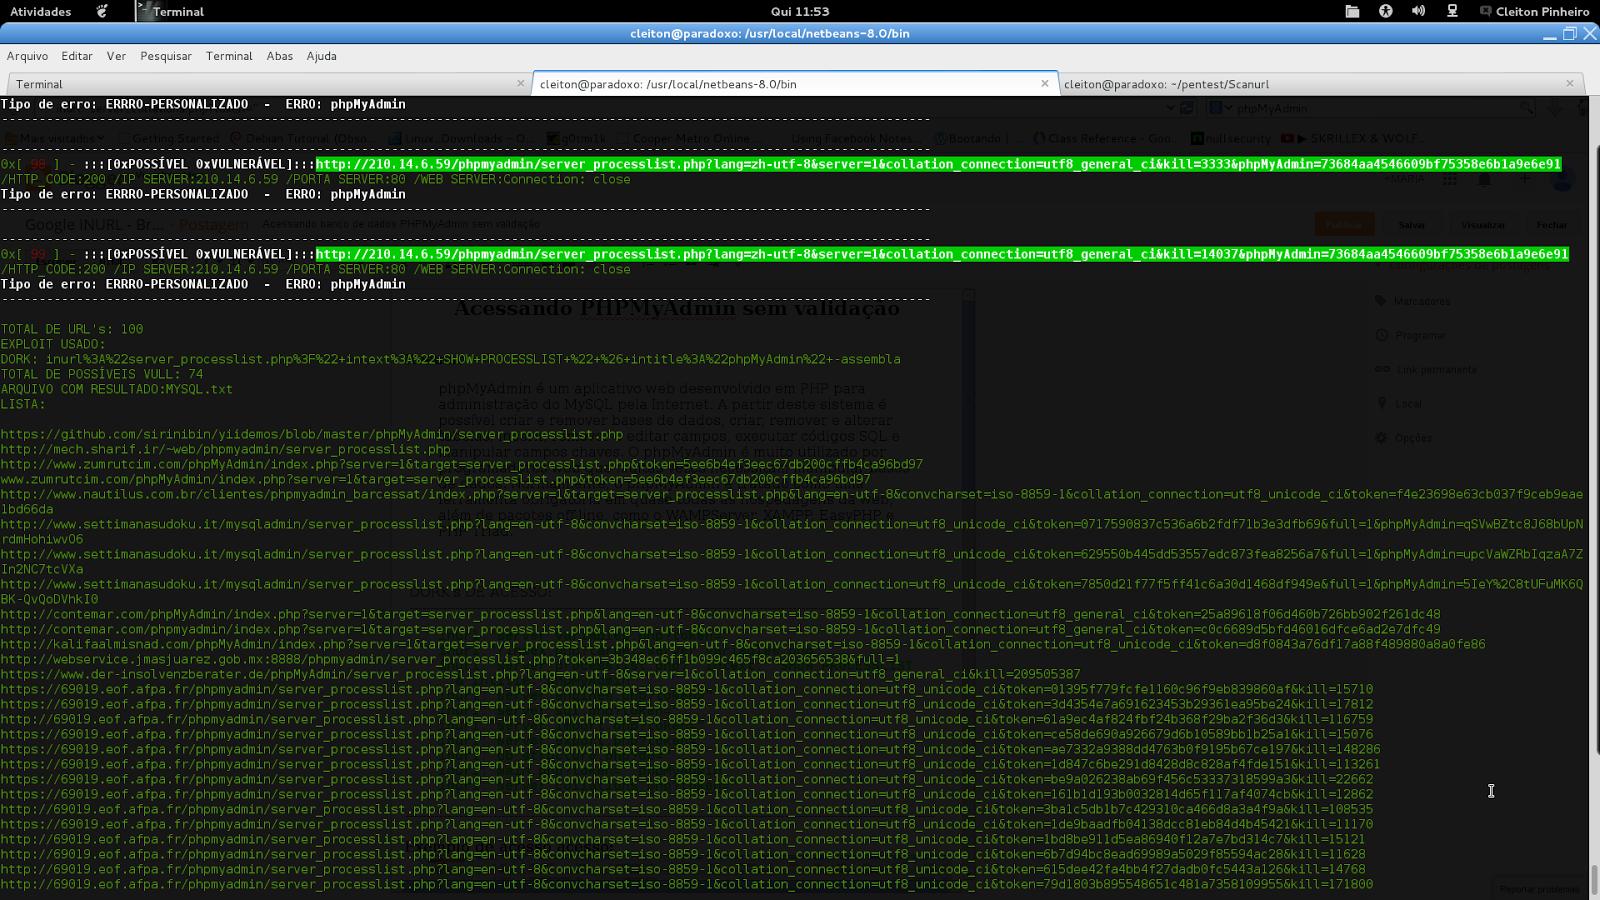 Usando SCANNER INURL para facilitar a busca.